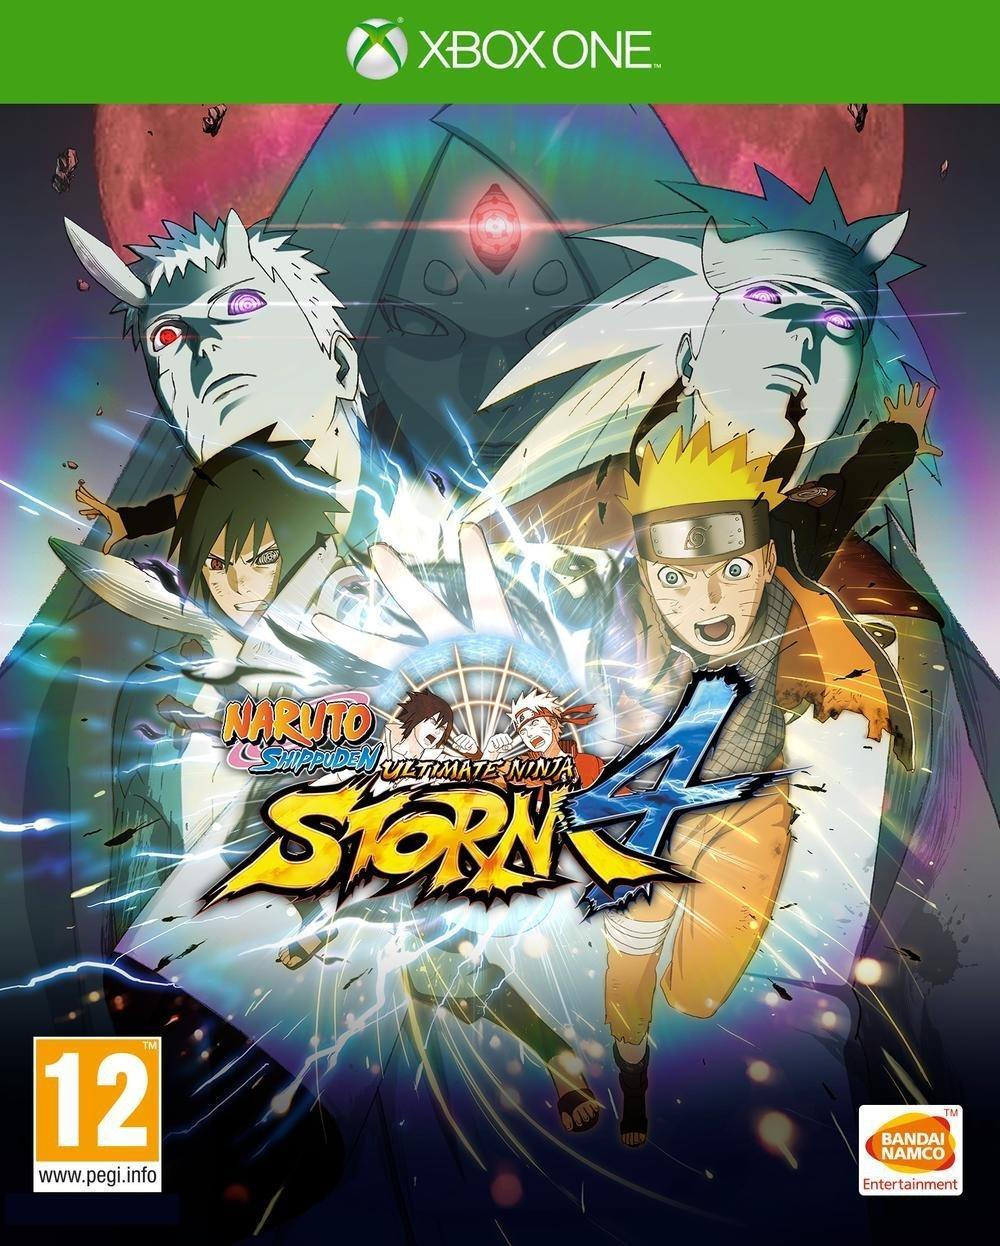 [Premium] Naruto Shippuden : Ultimate Ninja Storm 4 sur Xbox One et PS4